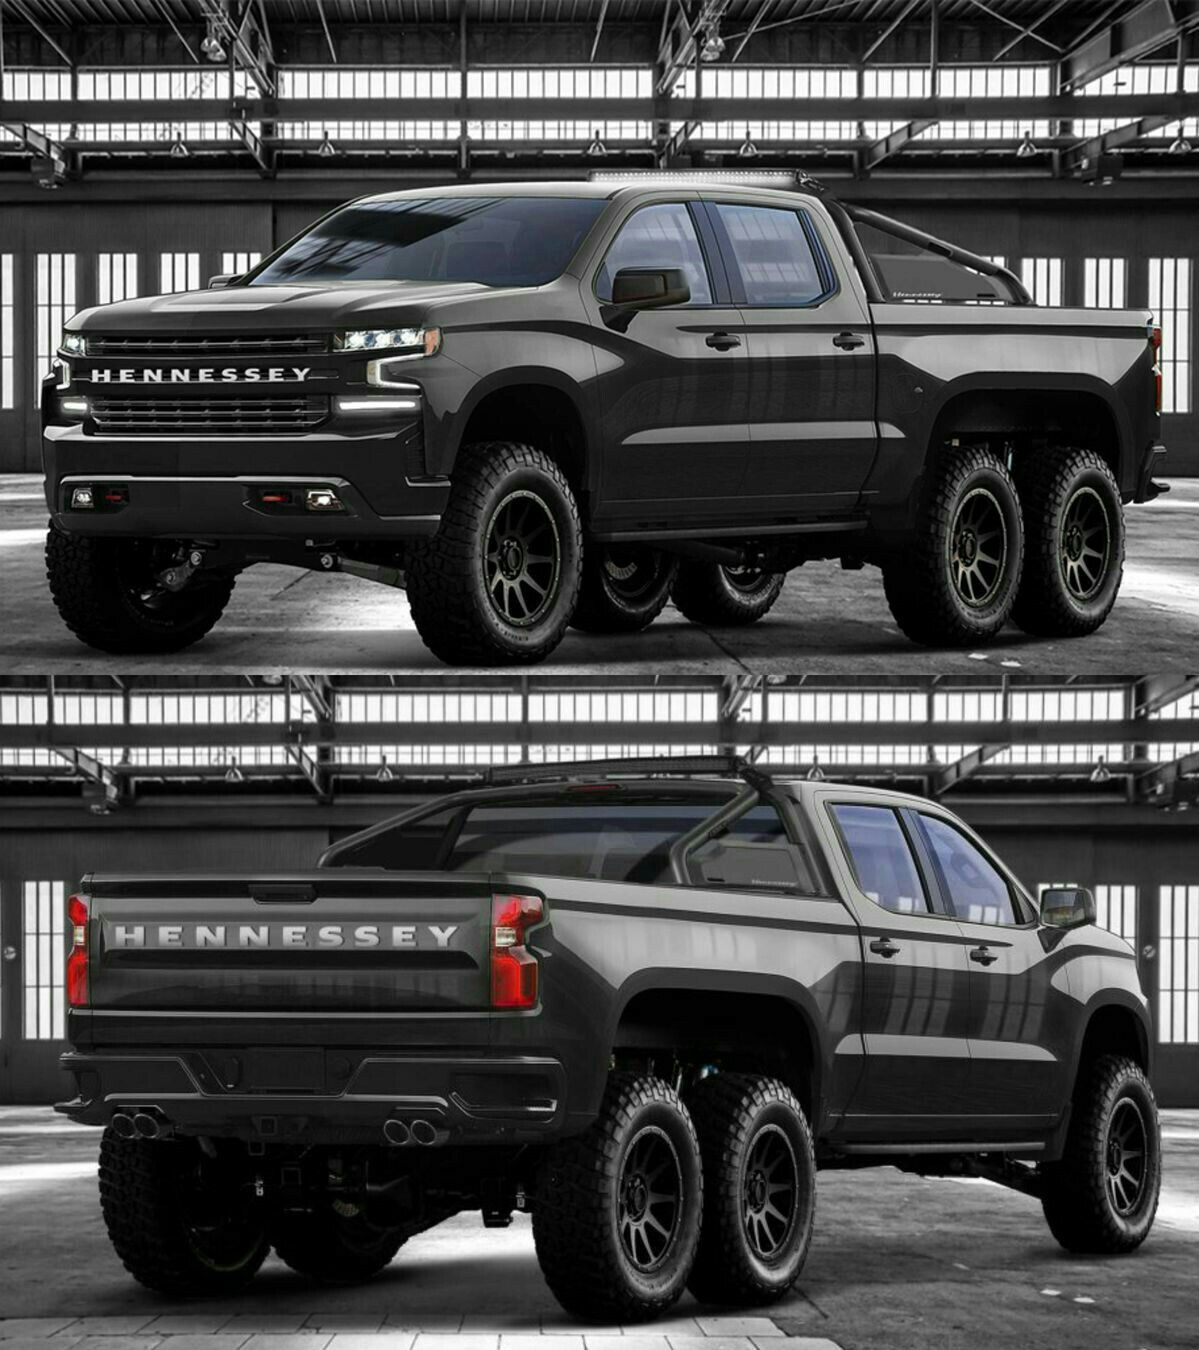 375000 Silverado 6 6 Goliath Over Than 700hp Chevrolet Silverado Chevrolet Chevrolet Trucks